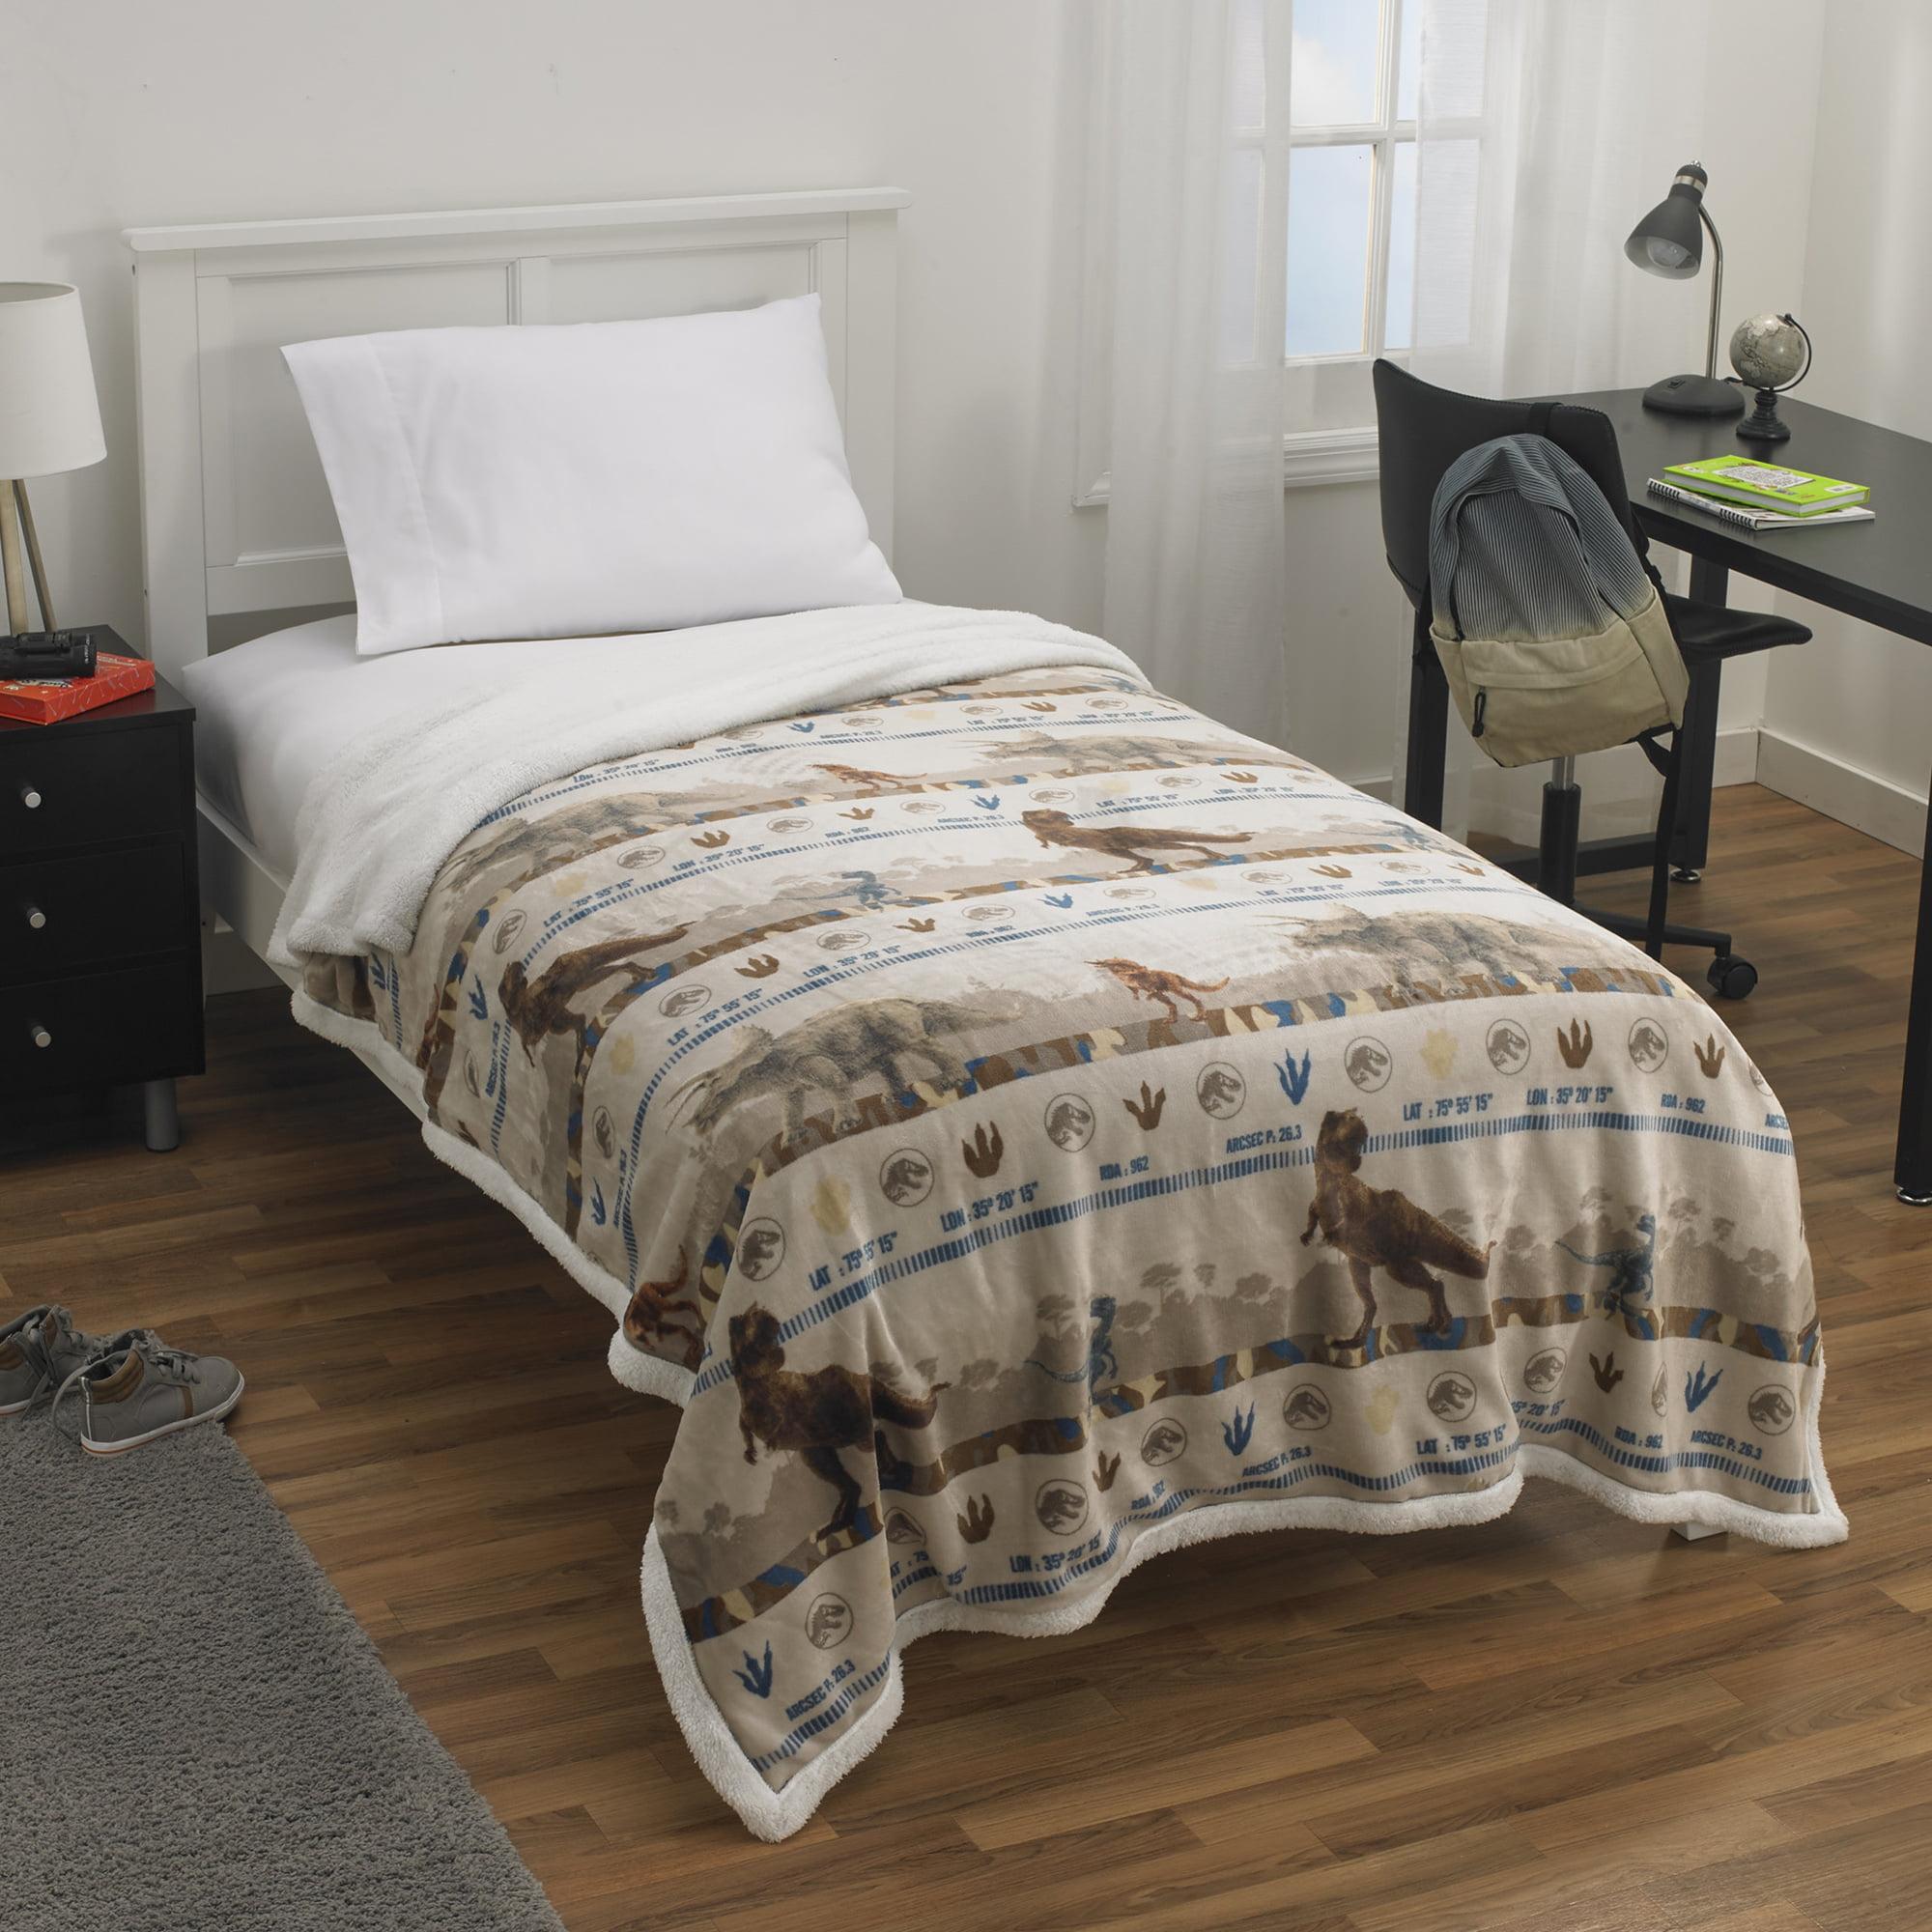 Jurassic Park Fleece Throws Blanket Sofa Warm Sherpa Print Blanket For Gift